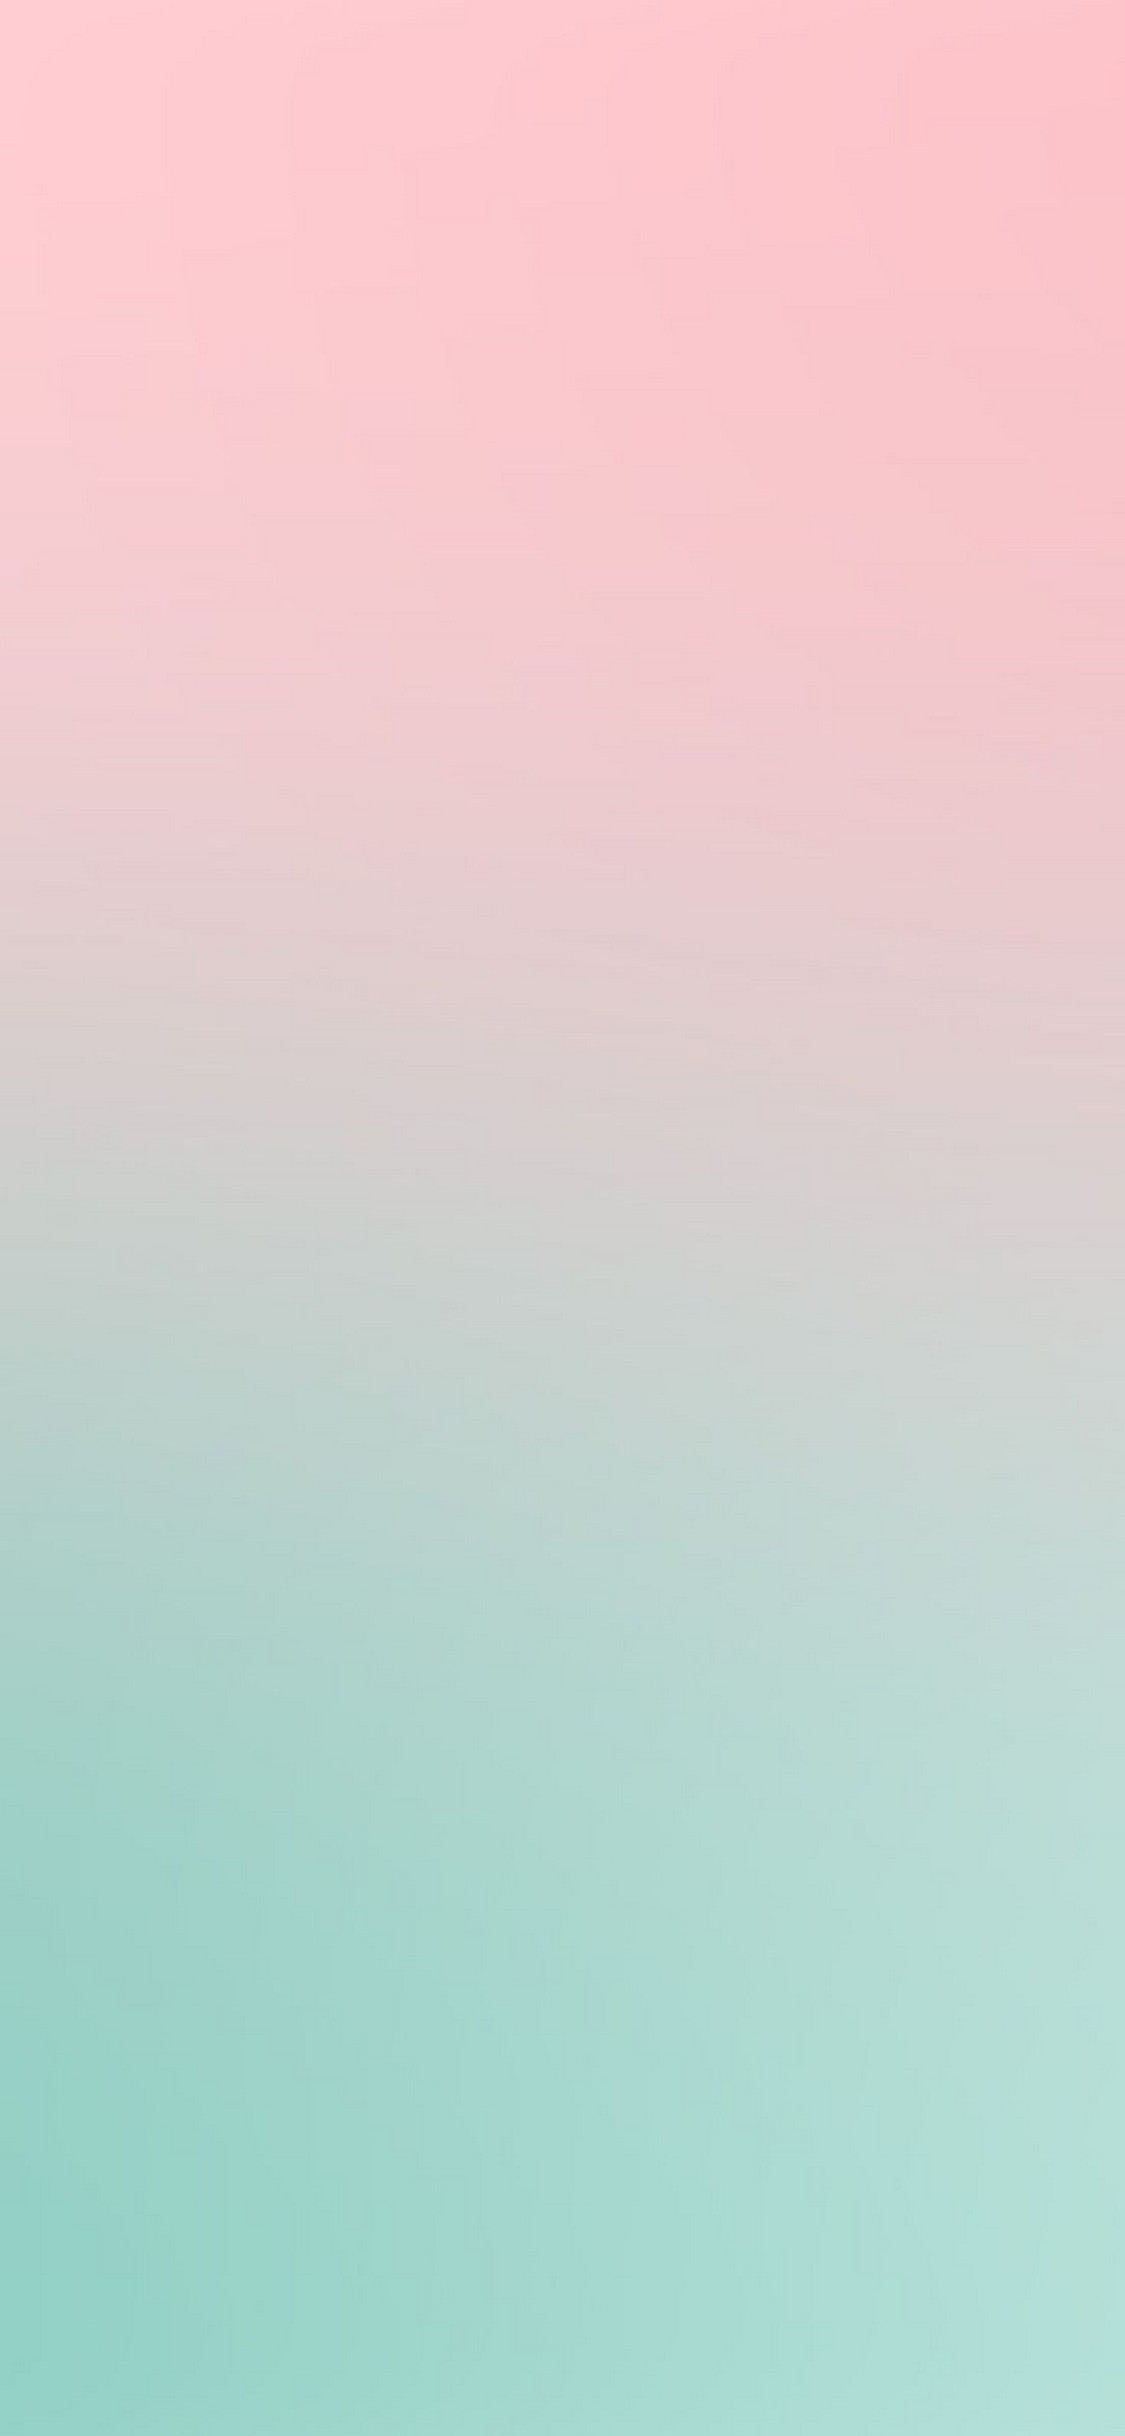 Iphone X Screen Lock Wallpaper 2020 Cute Iphone Wallpaper